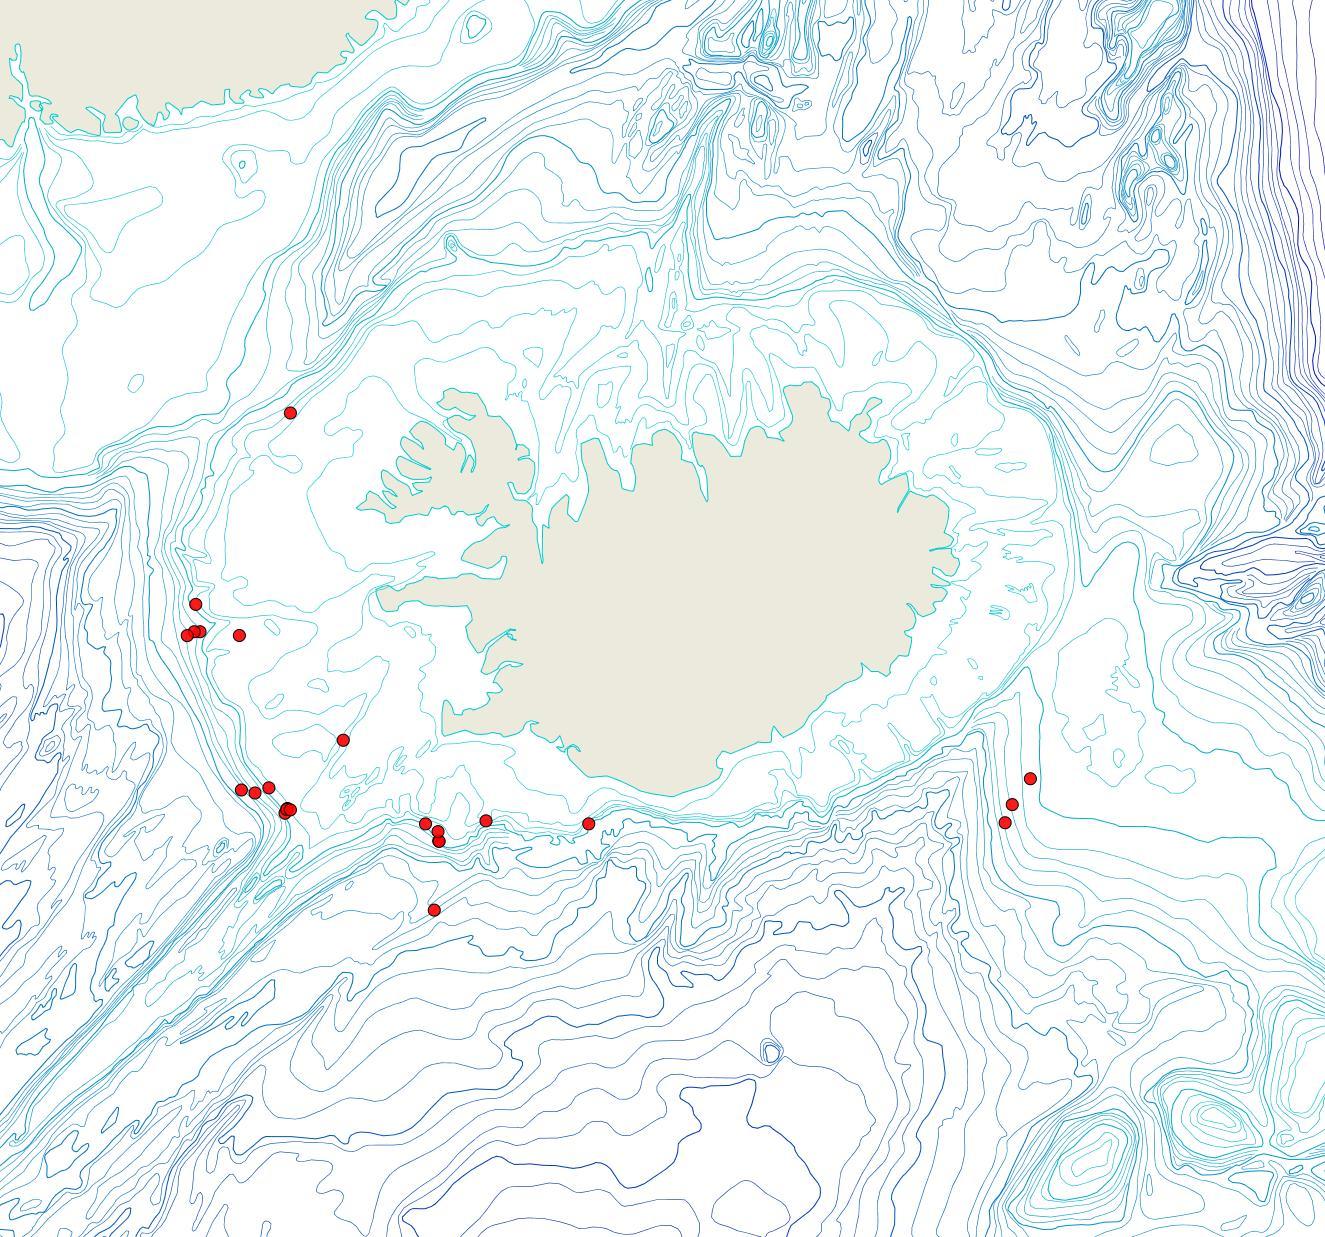 Útbreiðsla Palmiskenea faroensis(Bioice samples, red dots)